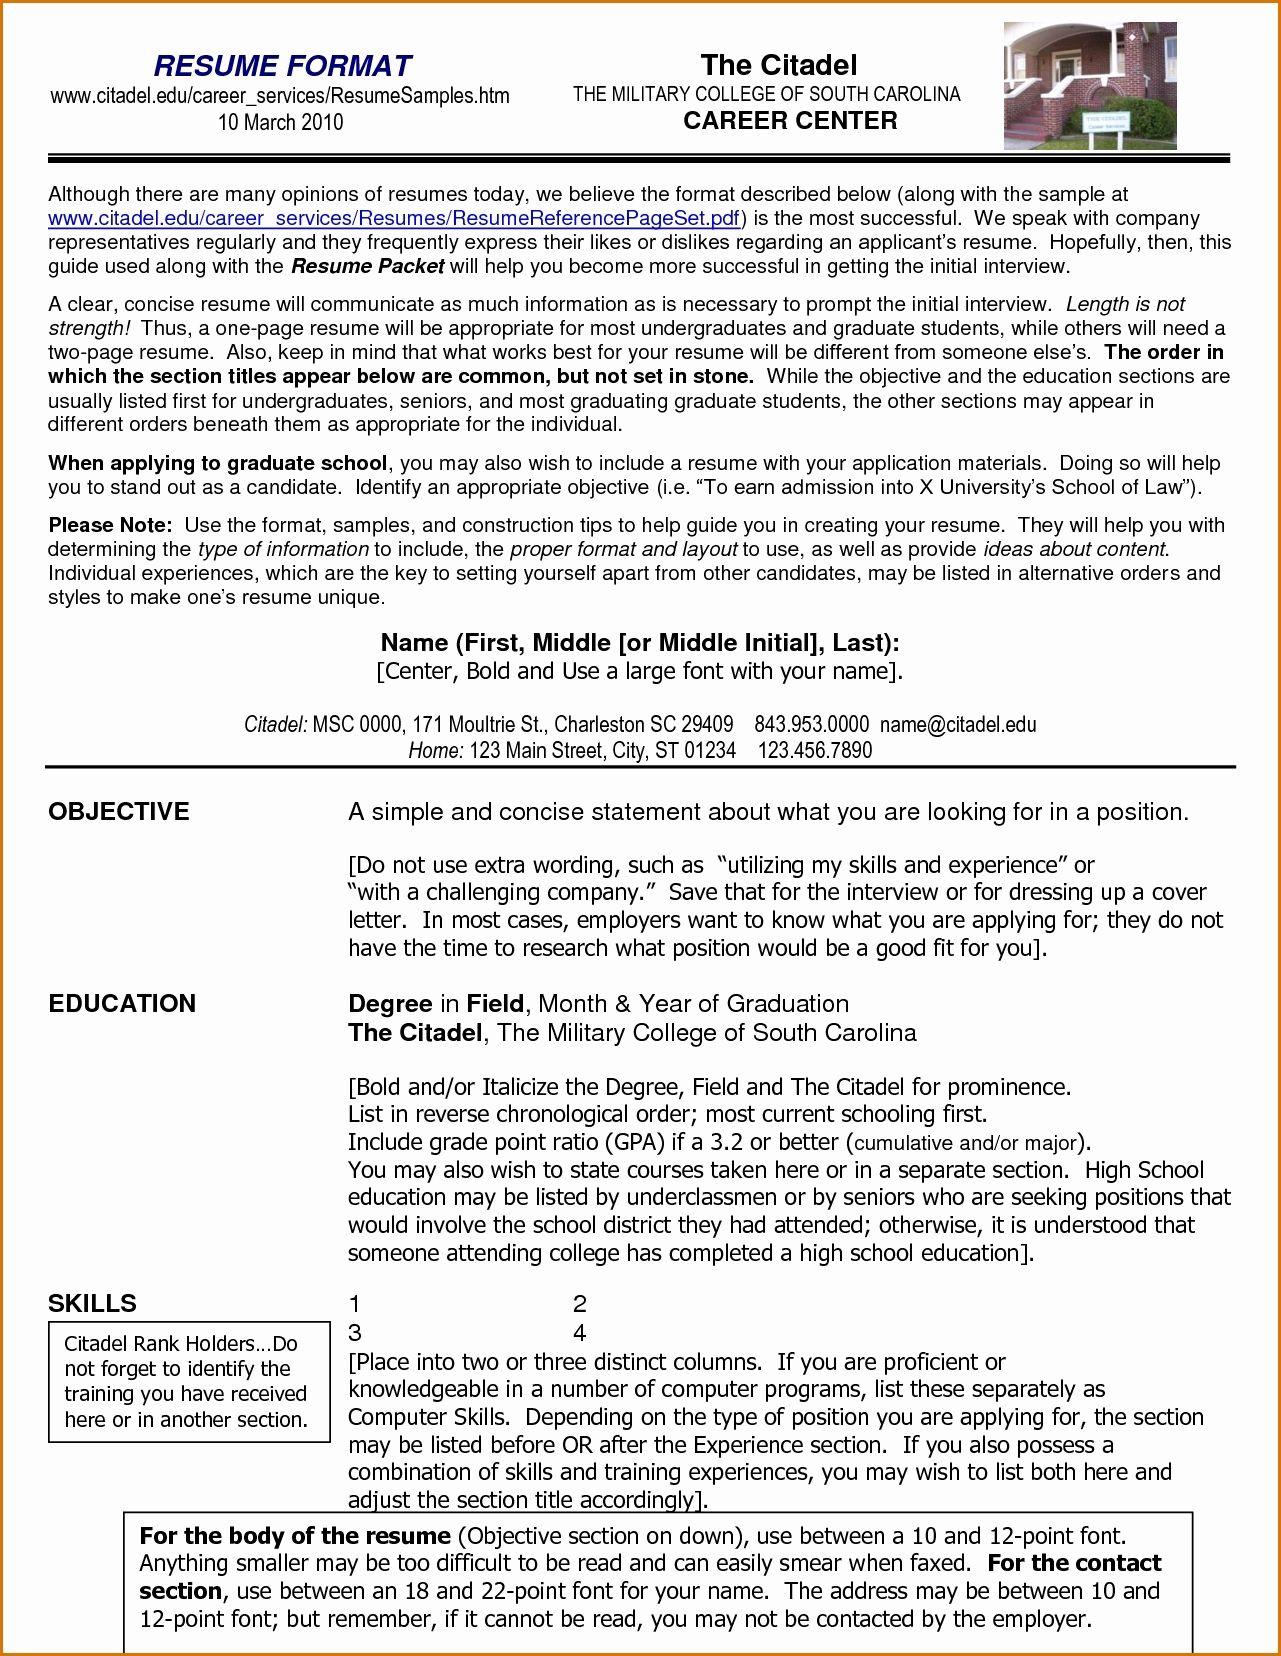 Resume Format New 2018 | Resume Format | Pinterest | Resume format ...